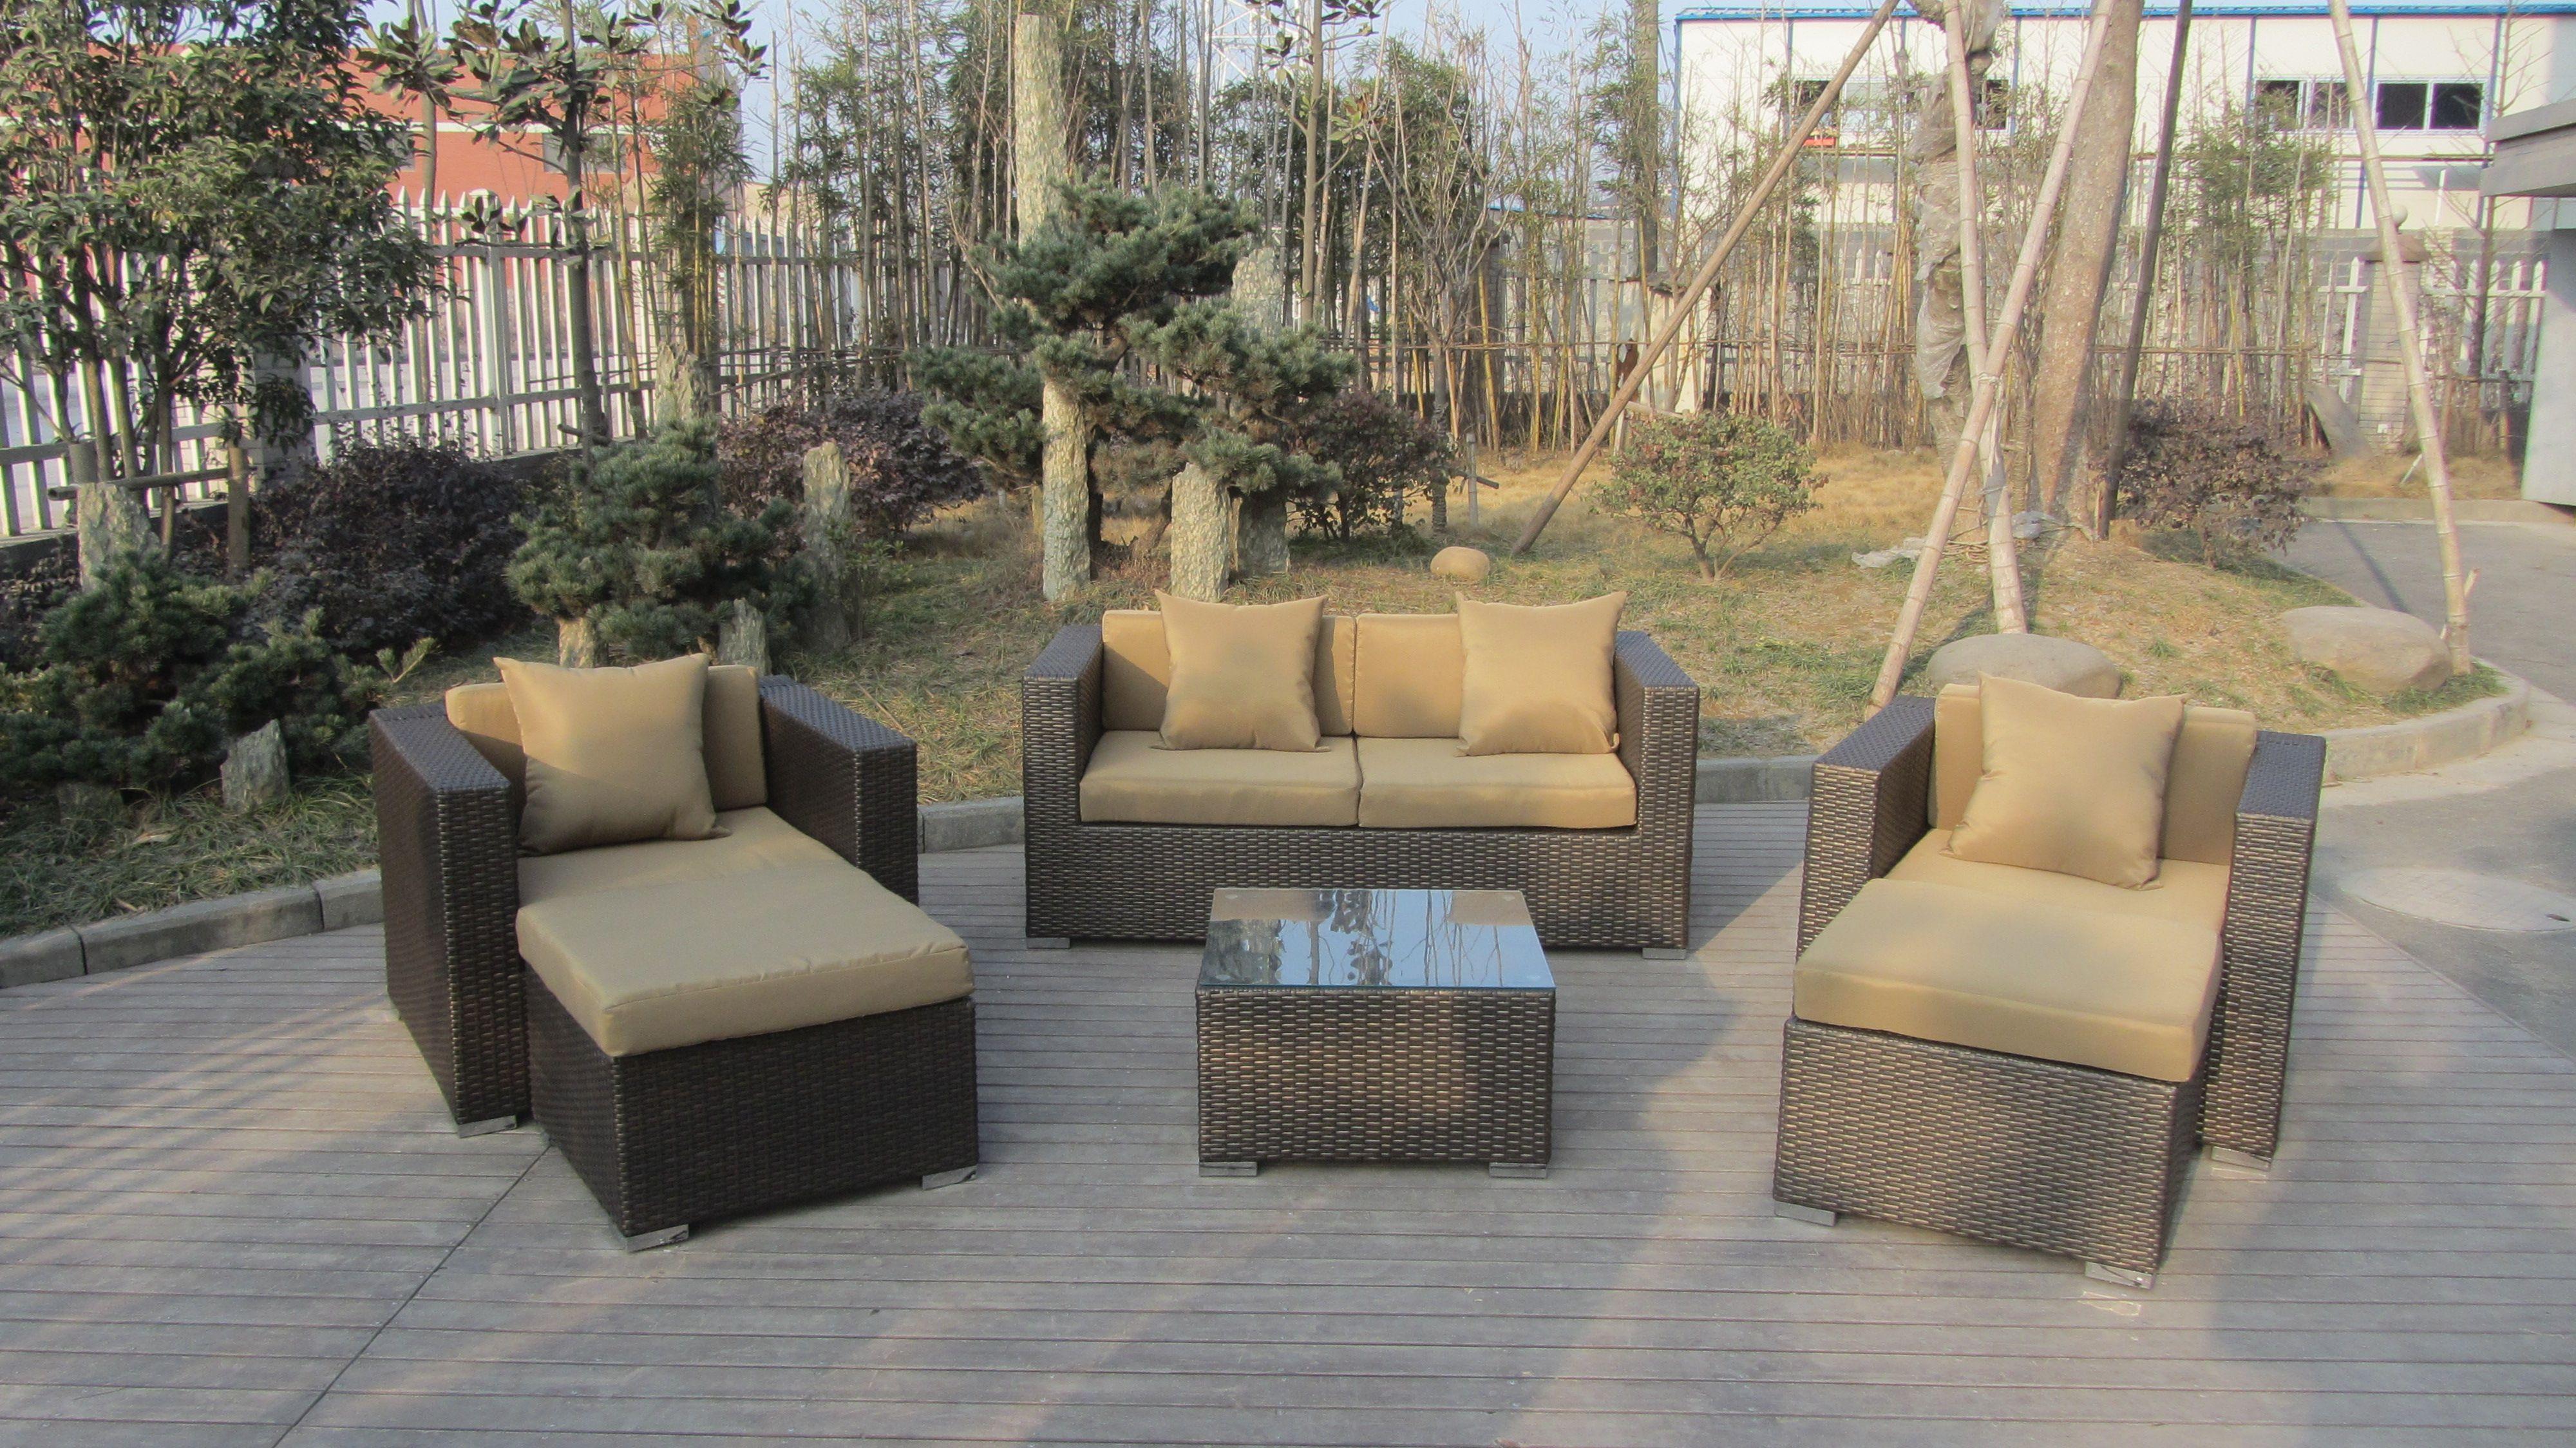 Home depot outdoor furniture